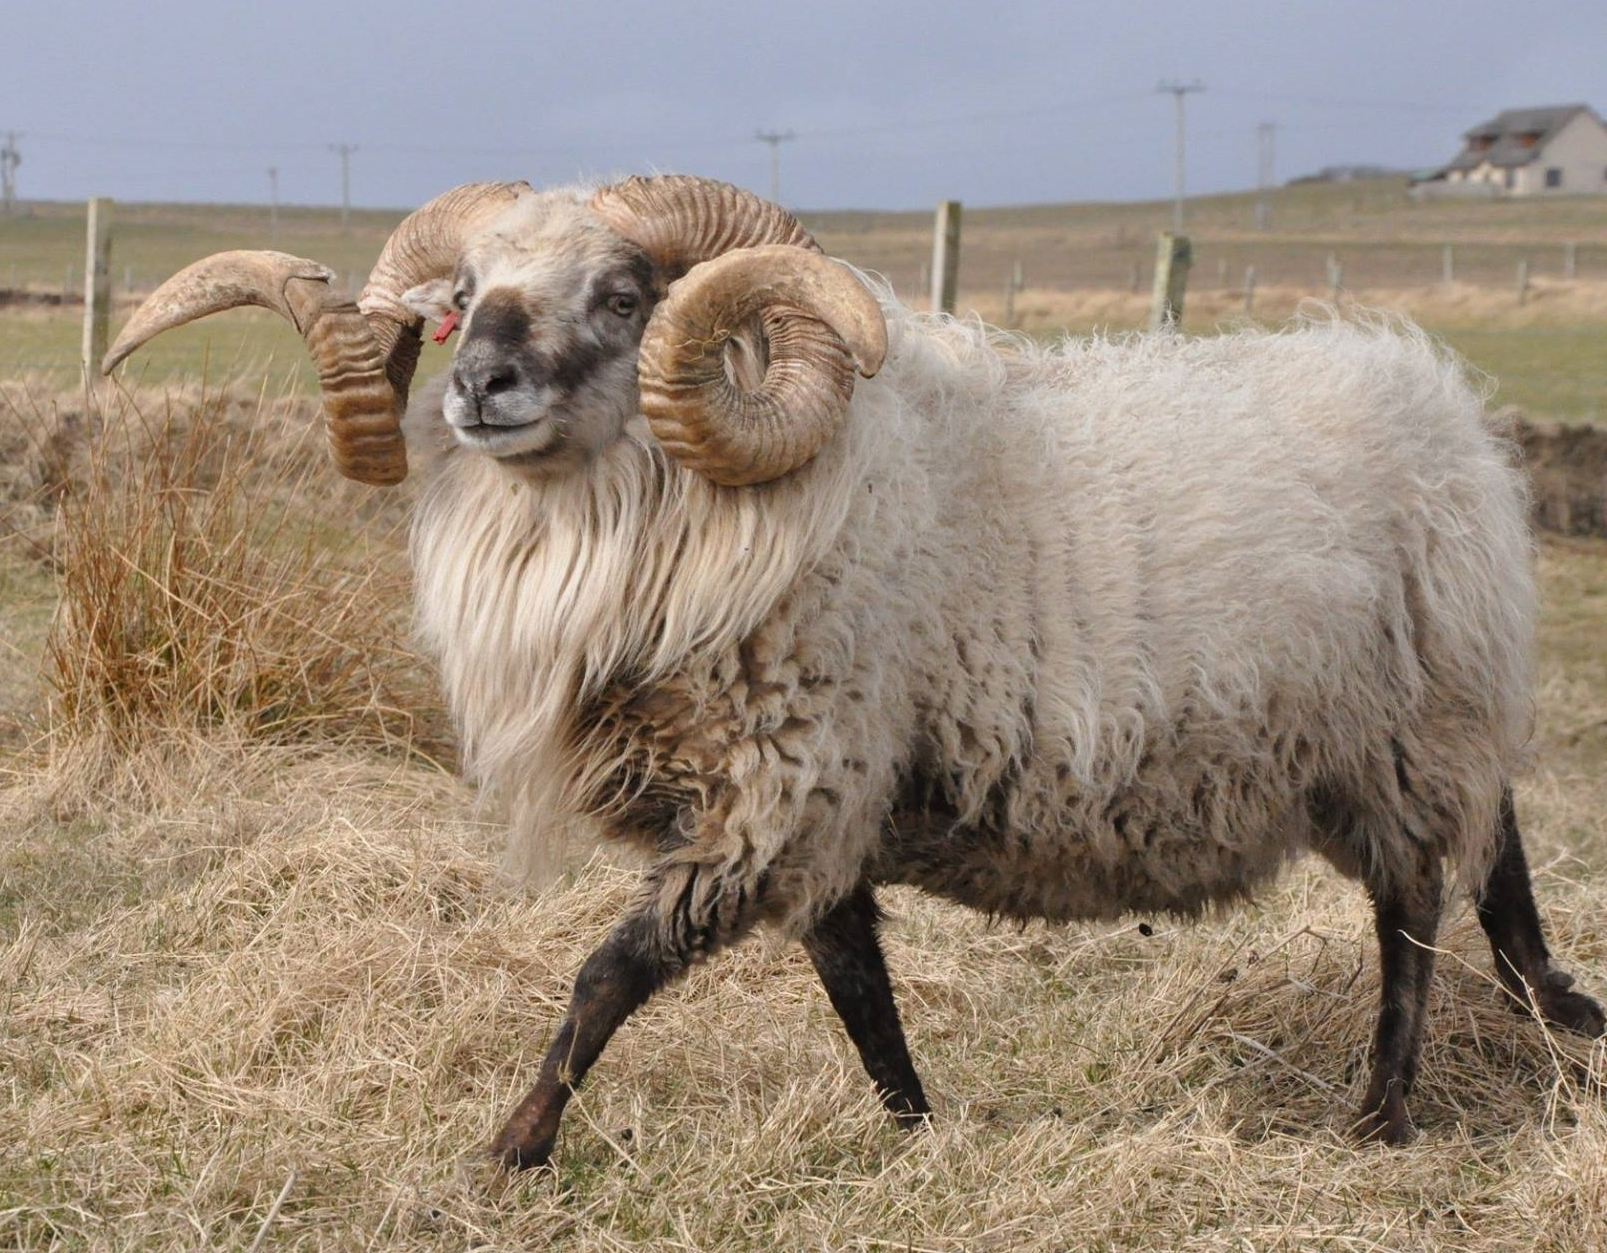 Settisgarth Bollocks — Orkney Boreray Ram